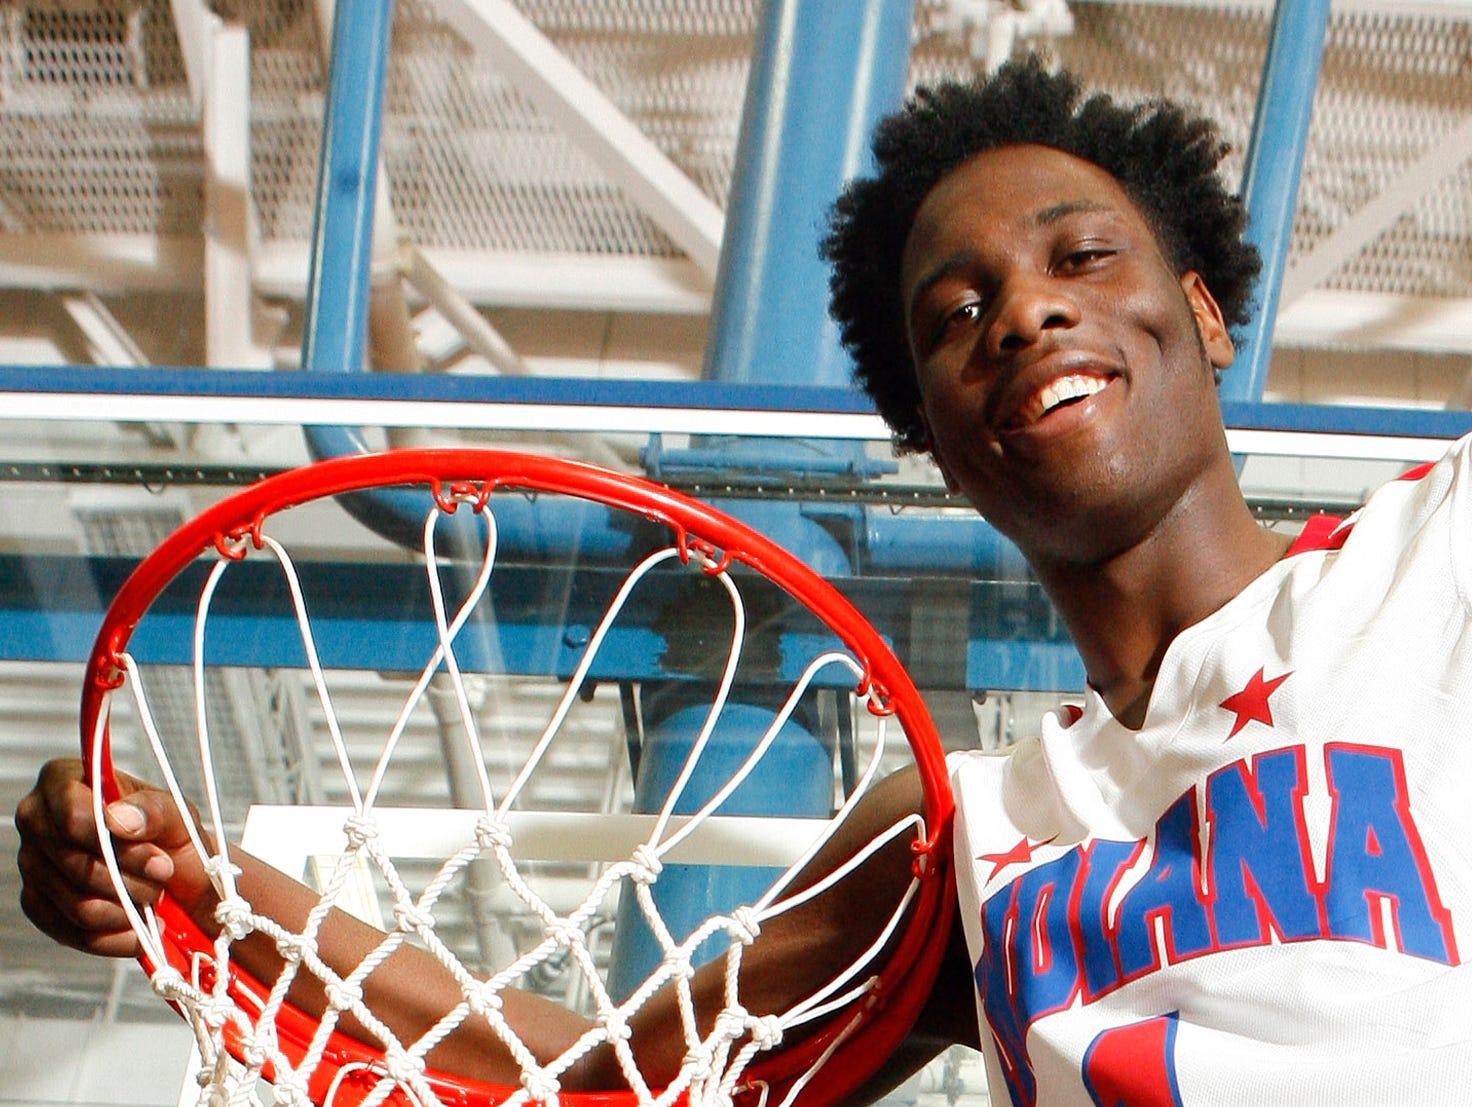 Homestead's Caleb Swanigan is the 2015 IndyStar Mr. Basketball.